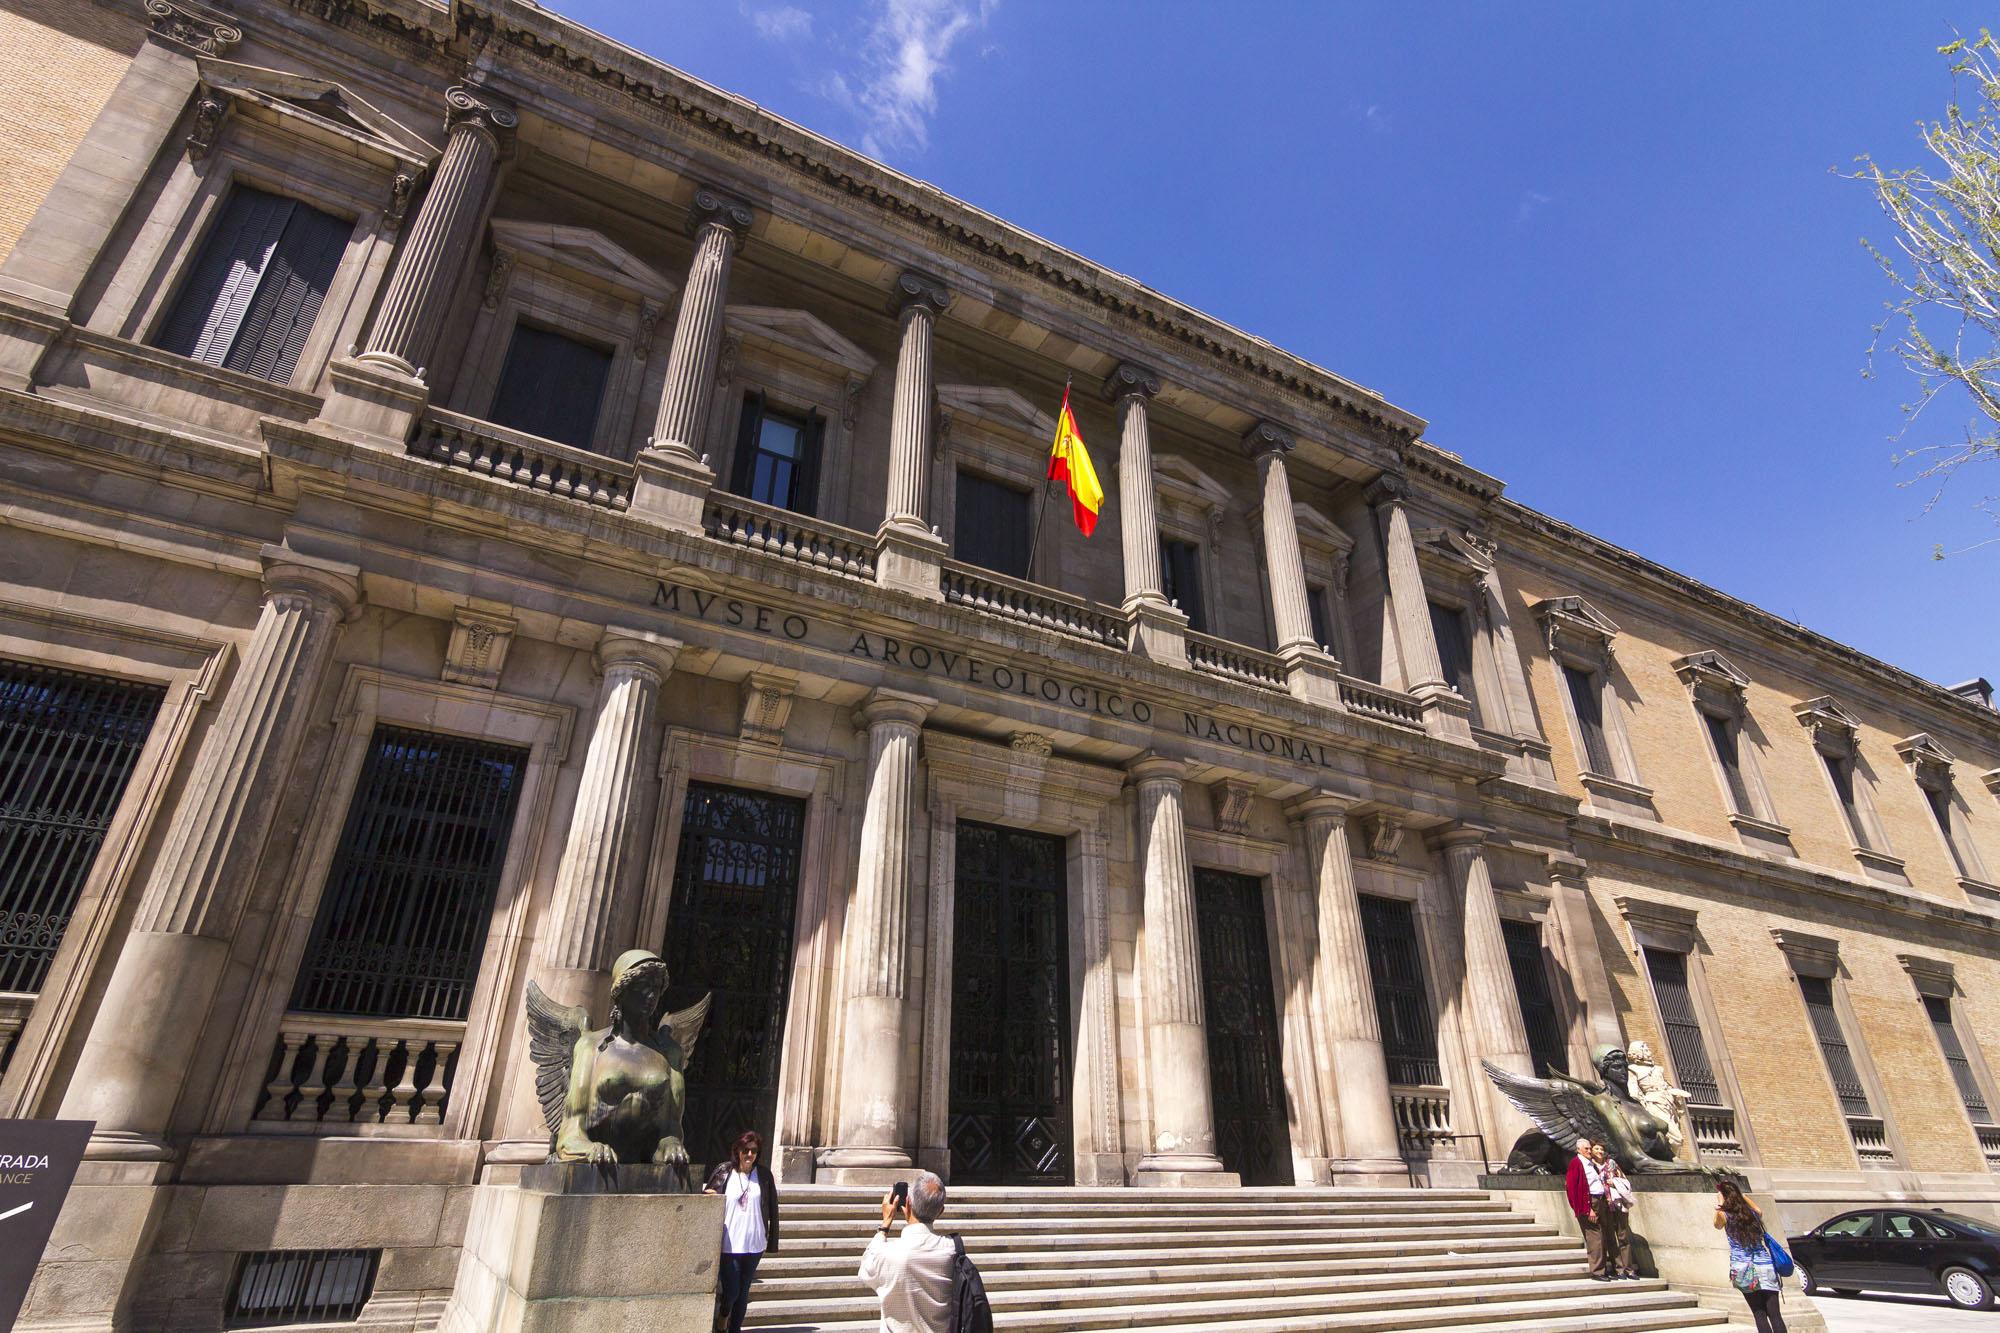 Museos en España - Turismo.org